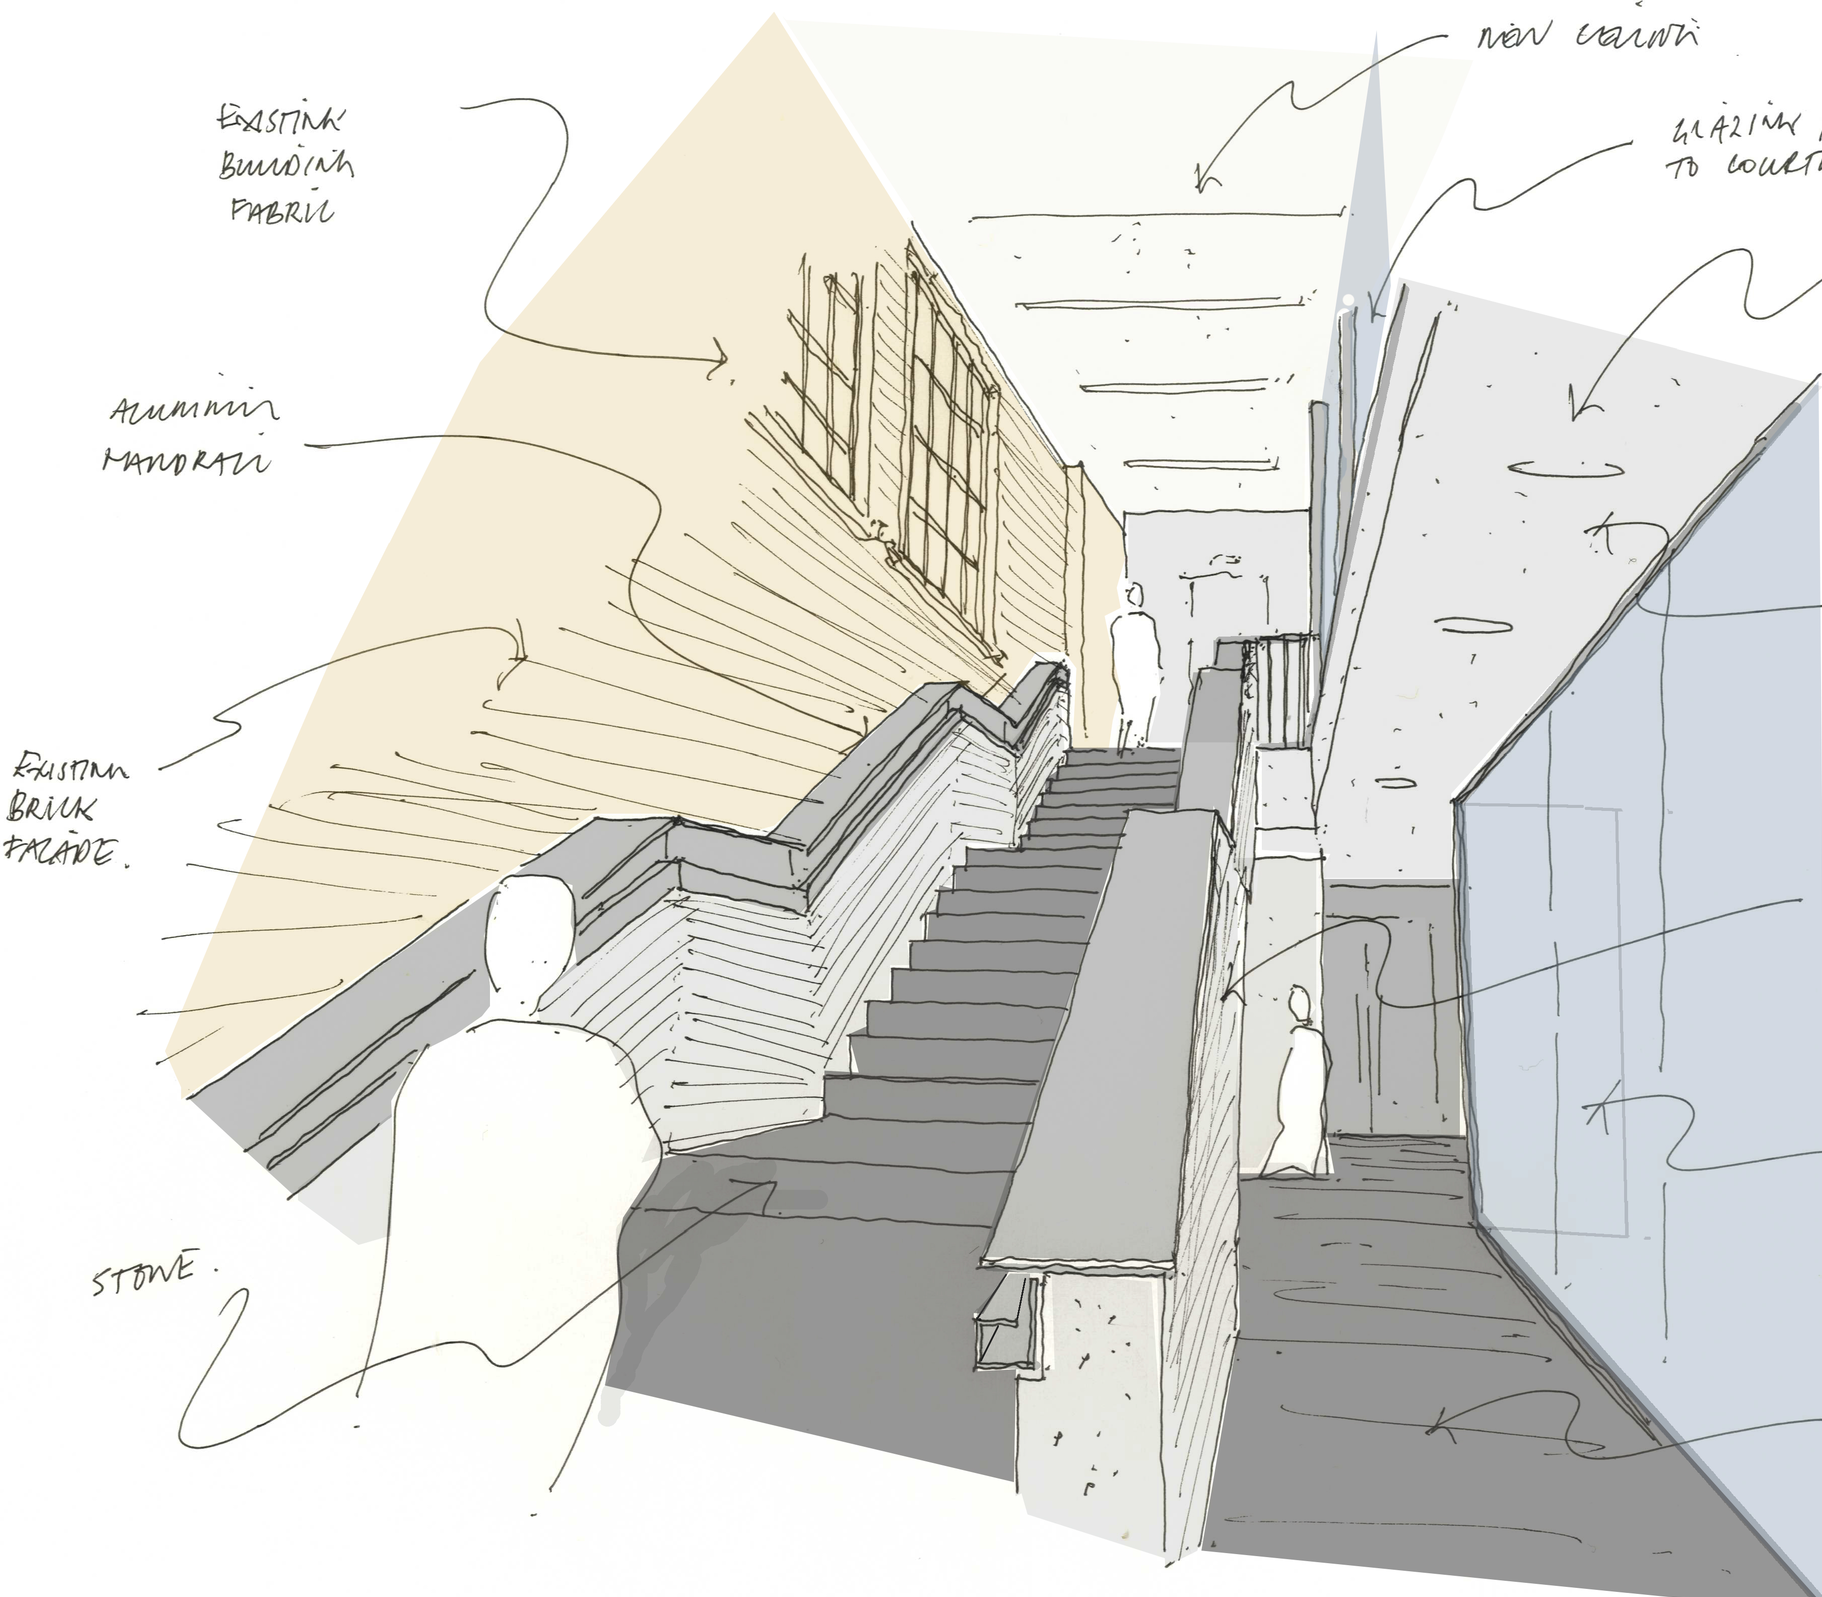 J1815_presentation_sketches_2014_10_24_Page_7.png